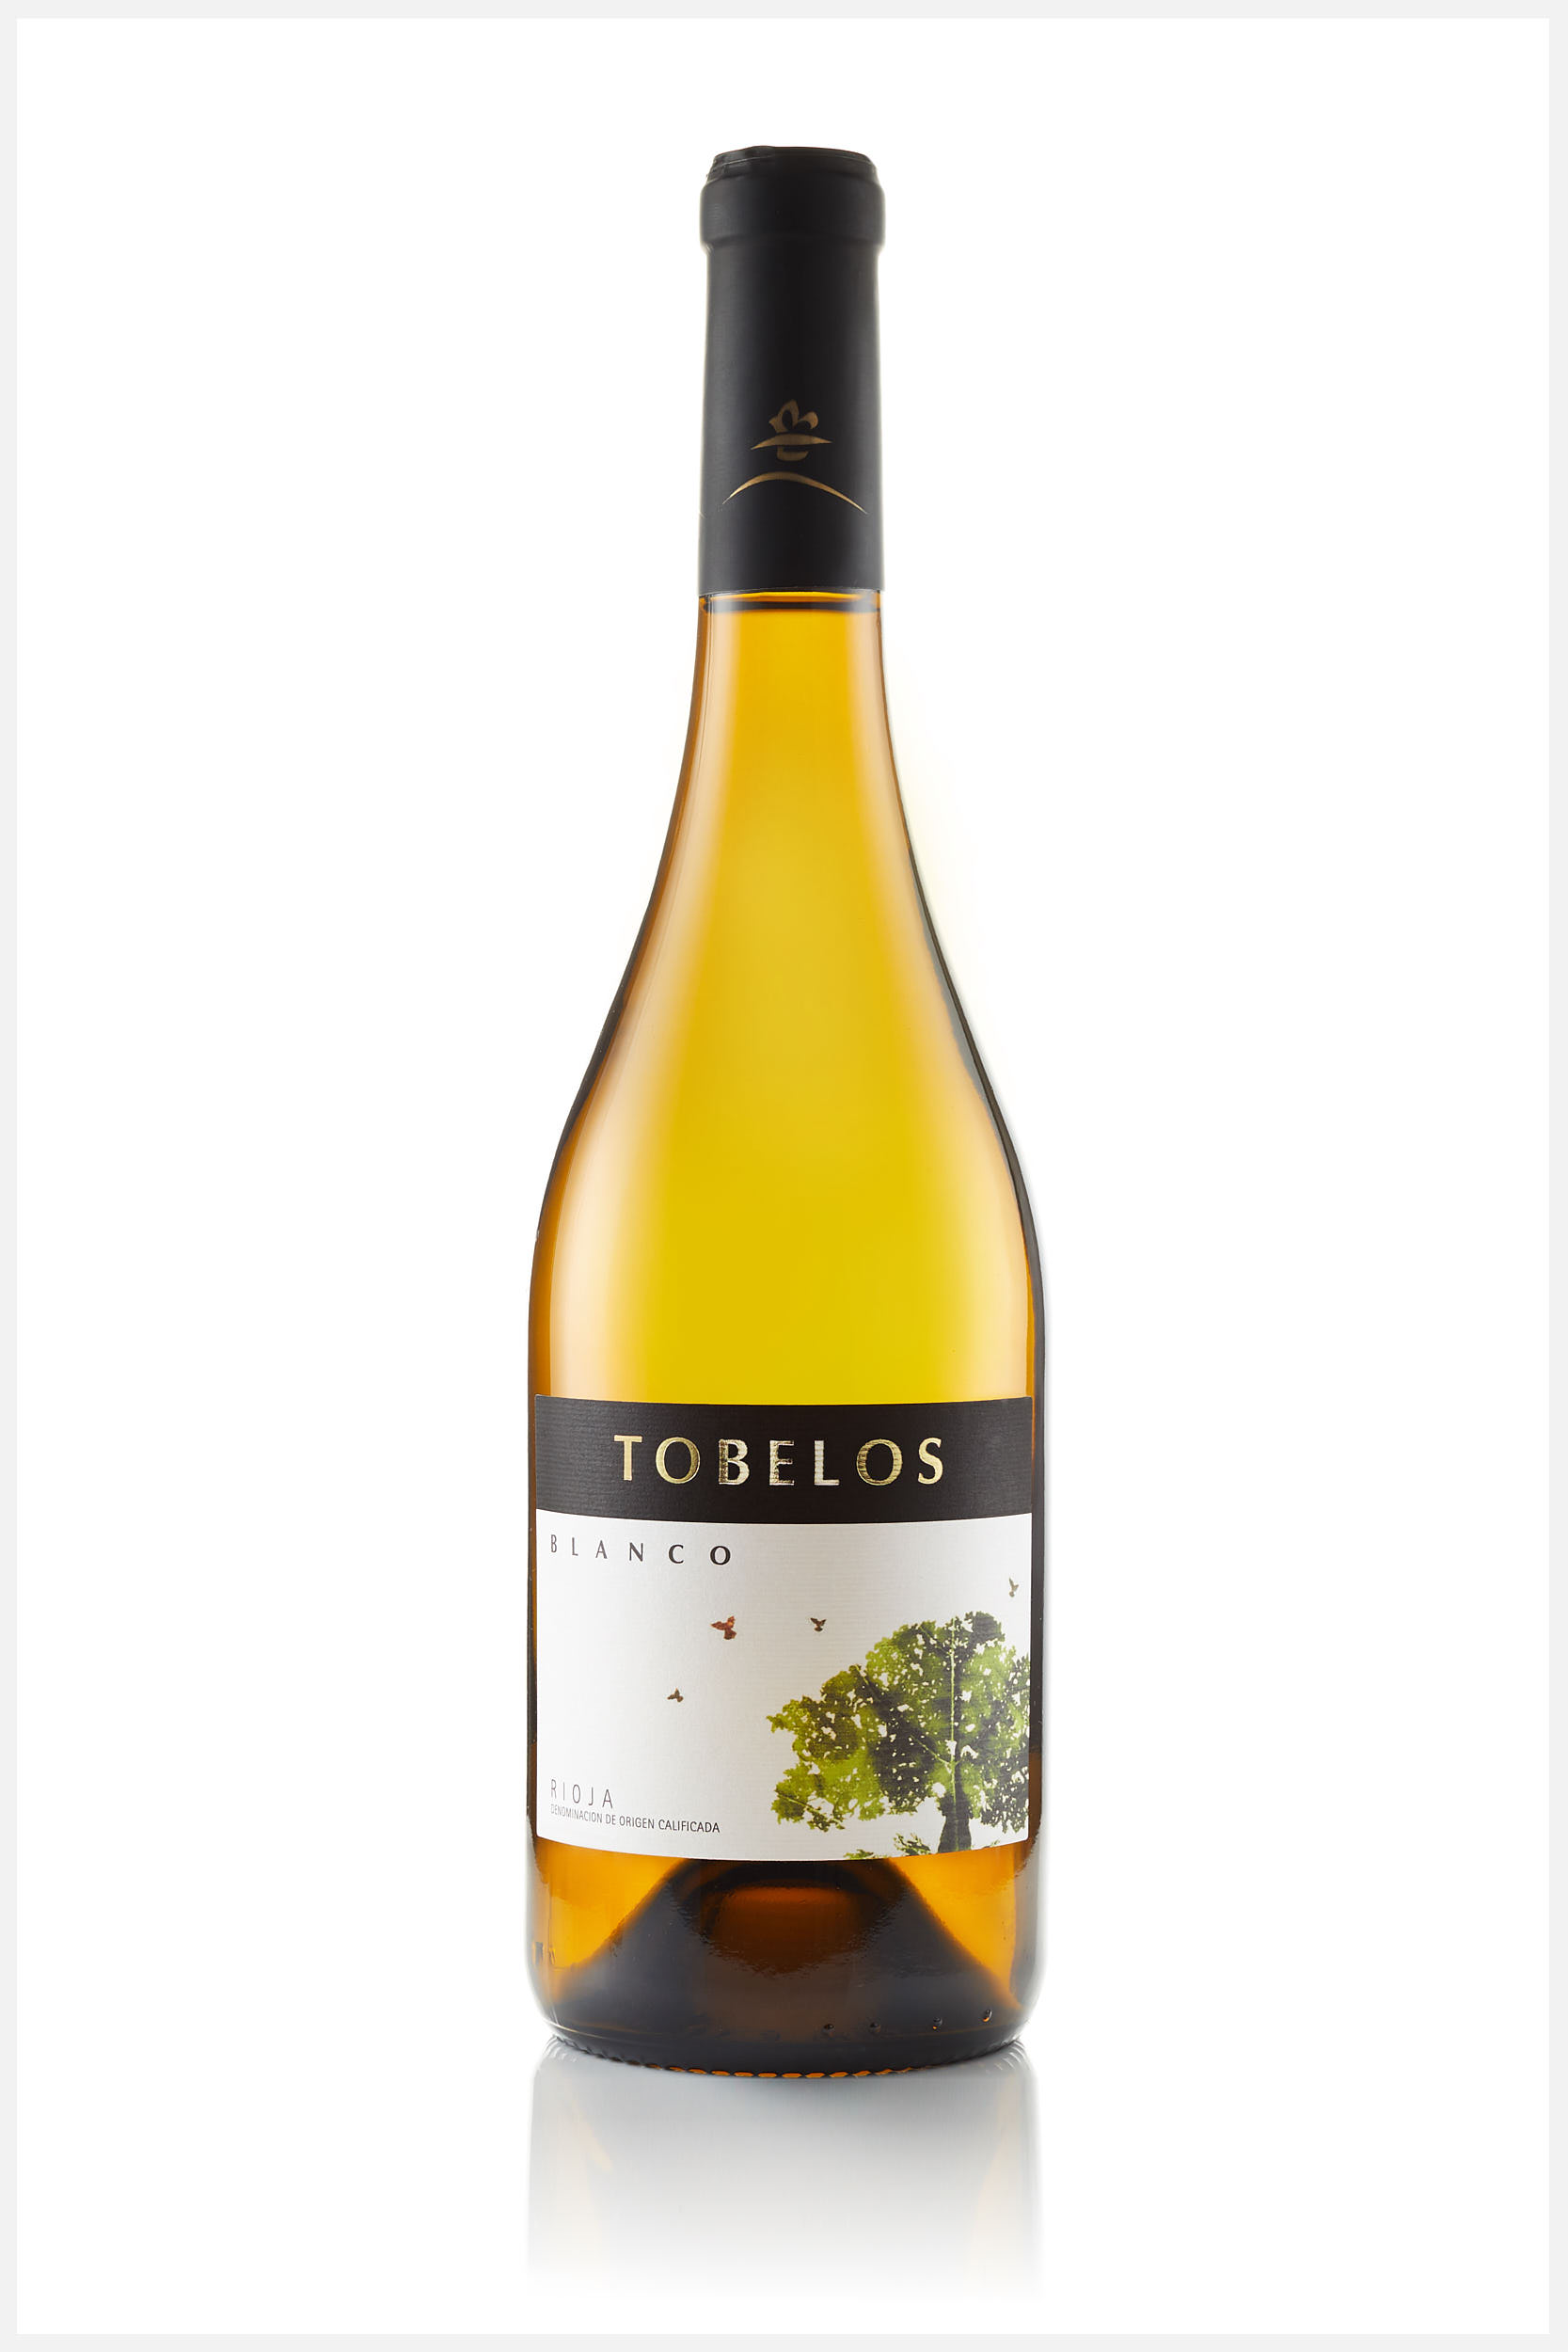 1901Commercial-professional-wine-photography-la-rioja-spain-James-Sturcke_0050.jpg